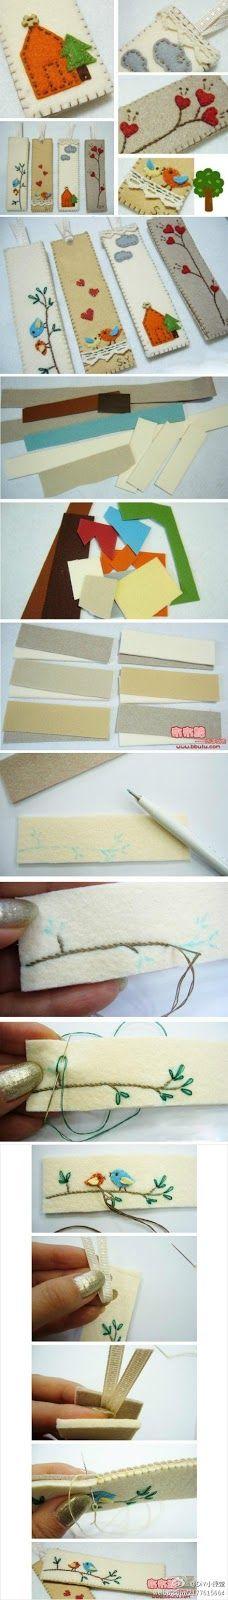 DIY:Marcador de livros de feltro...